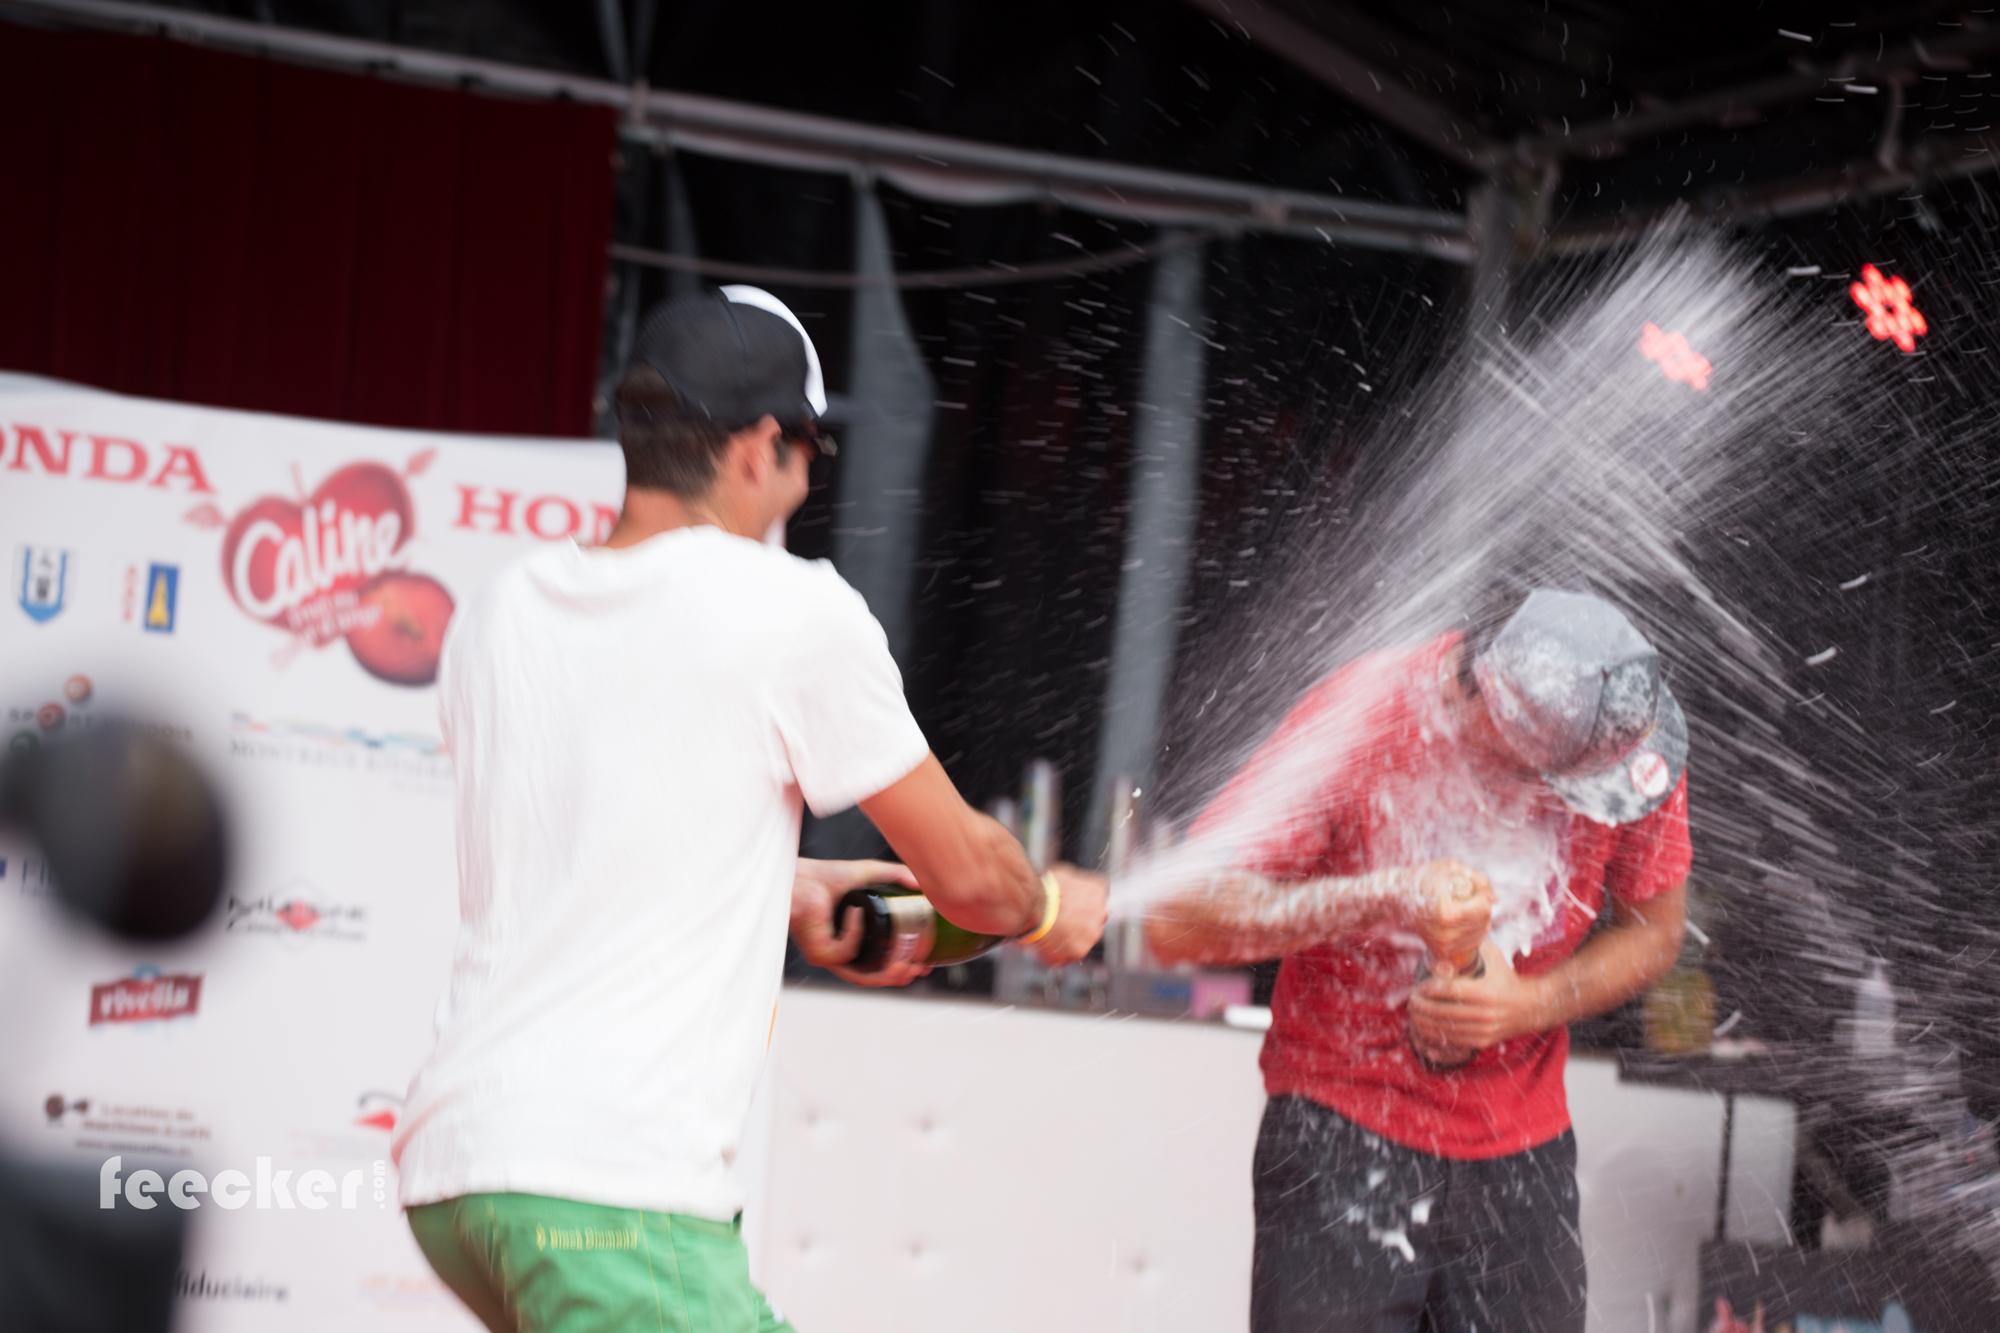 Podium Sonchaux acro Show Horacio Llorens Francois Ragolski  champagne shower